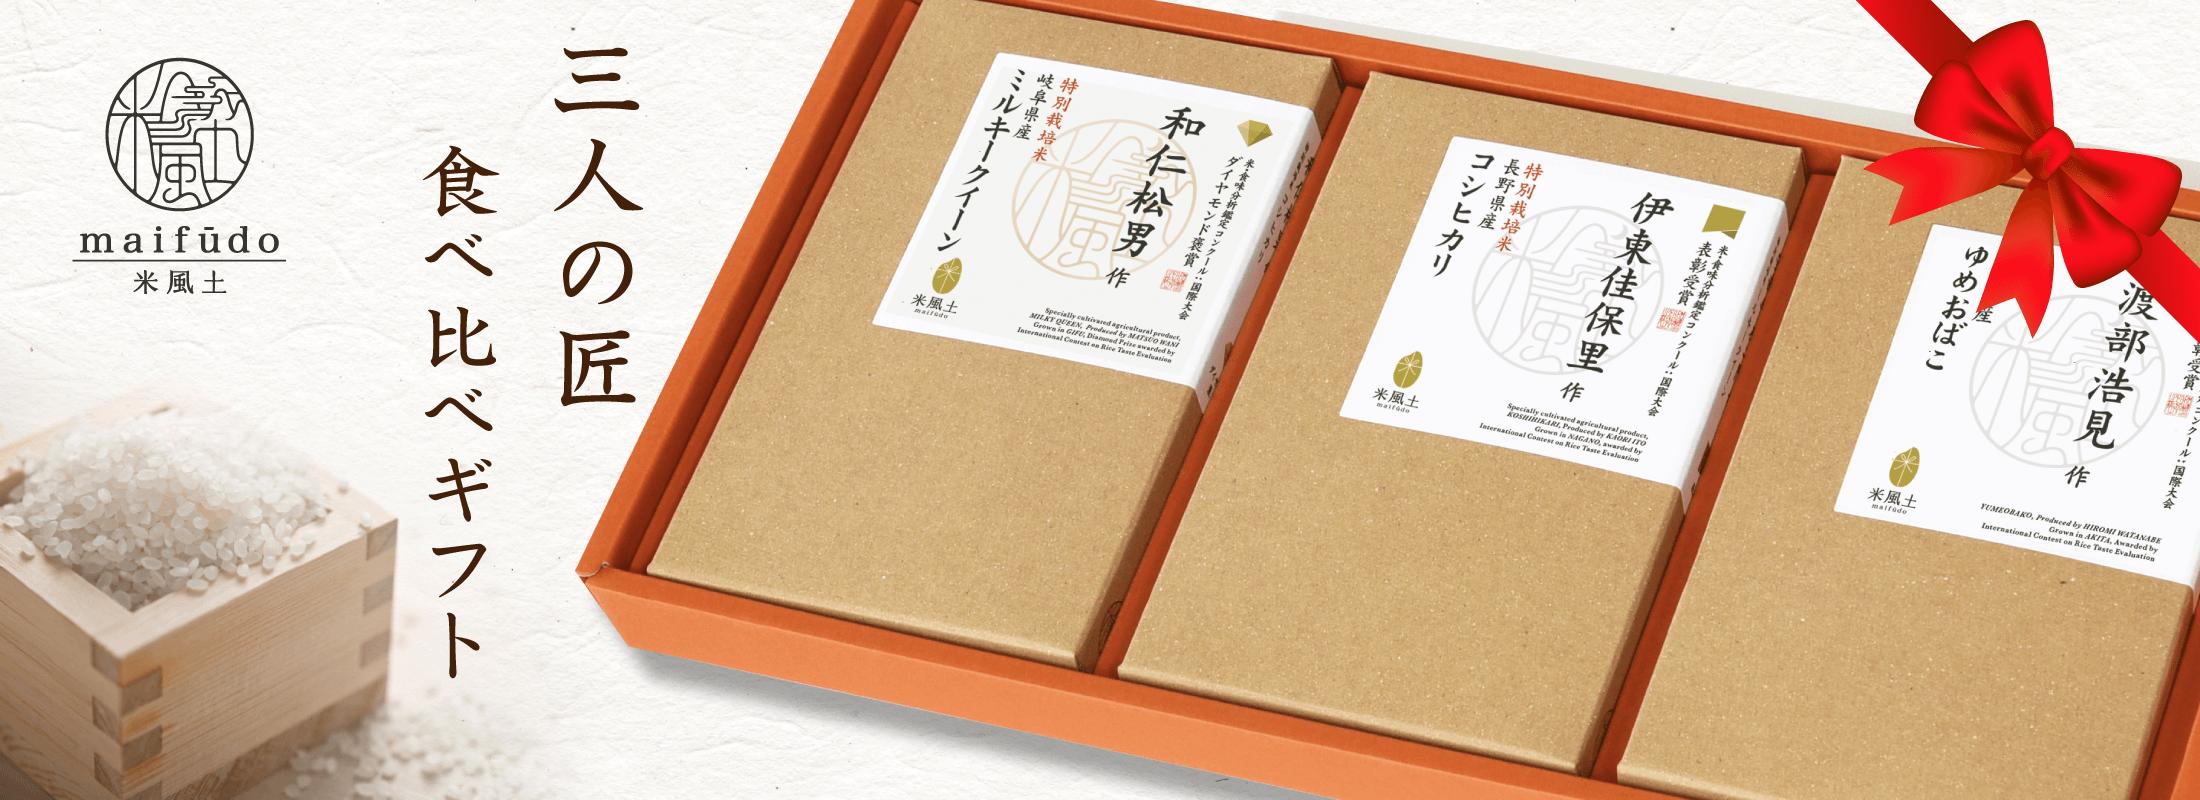 米風土GIFT BOX3